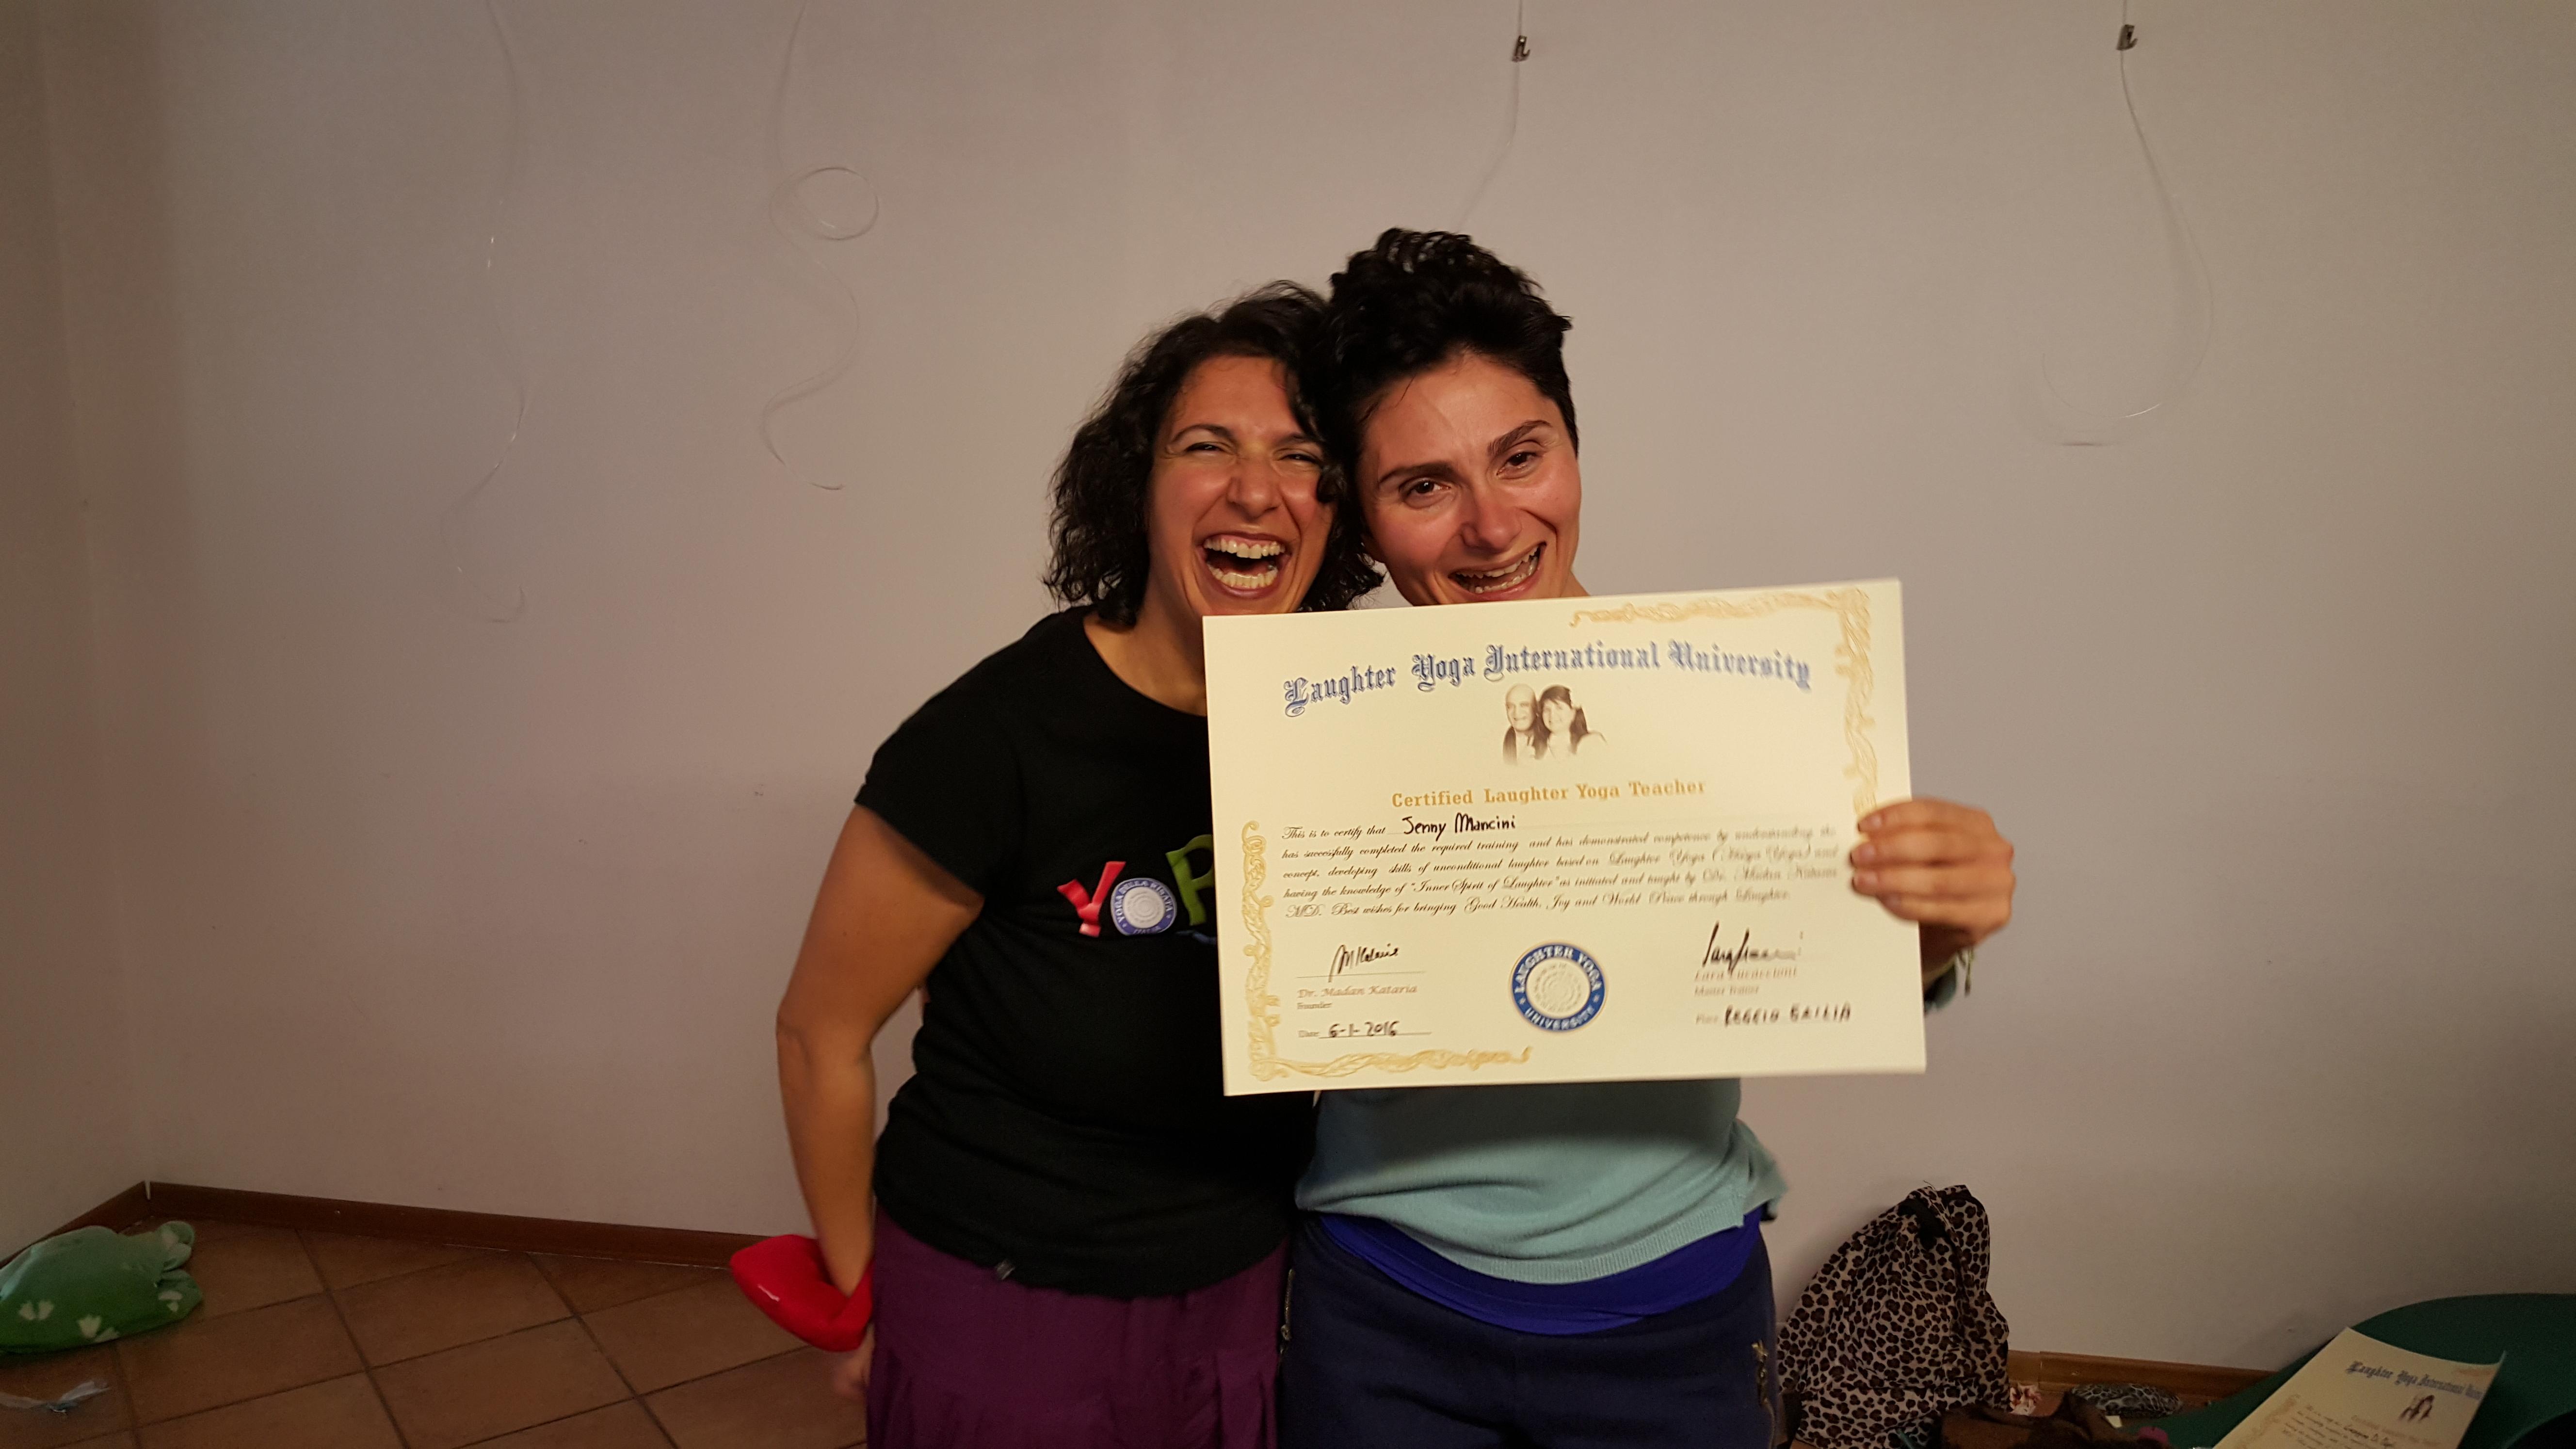 Jenny Mancini e Lara Lucaccioni